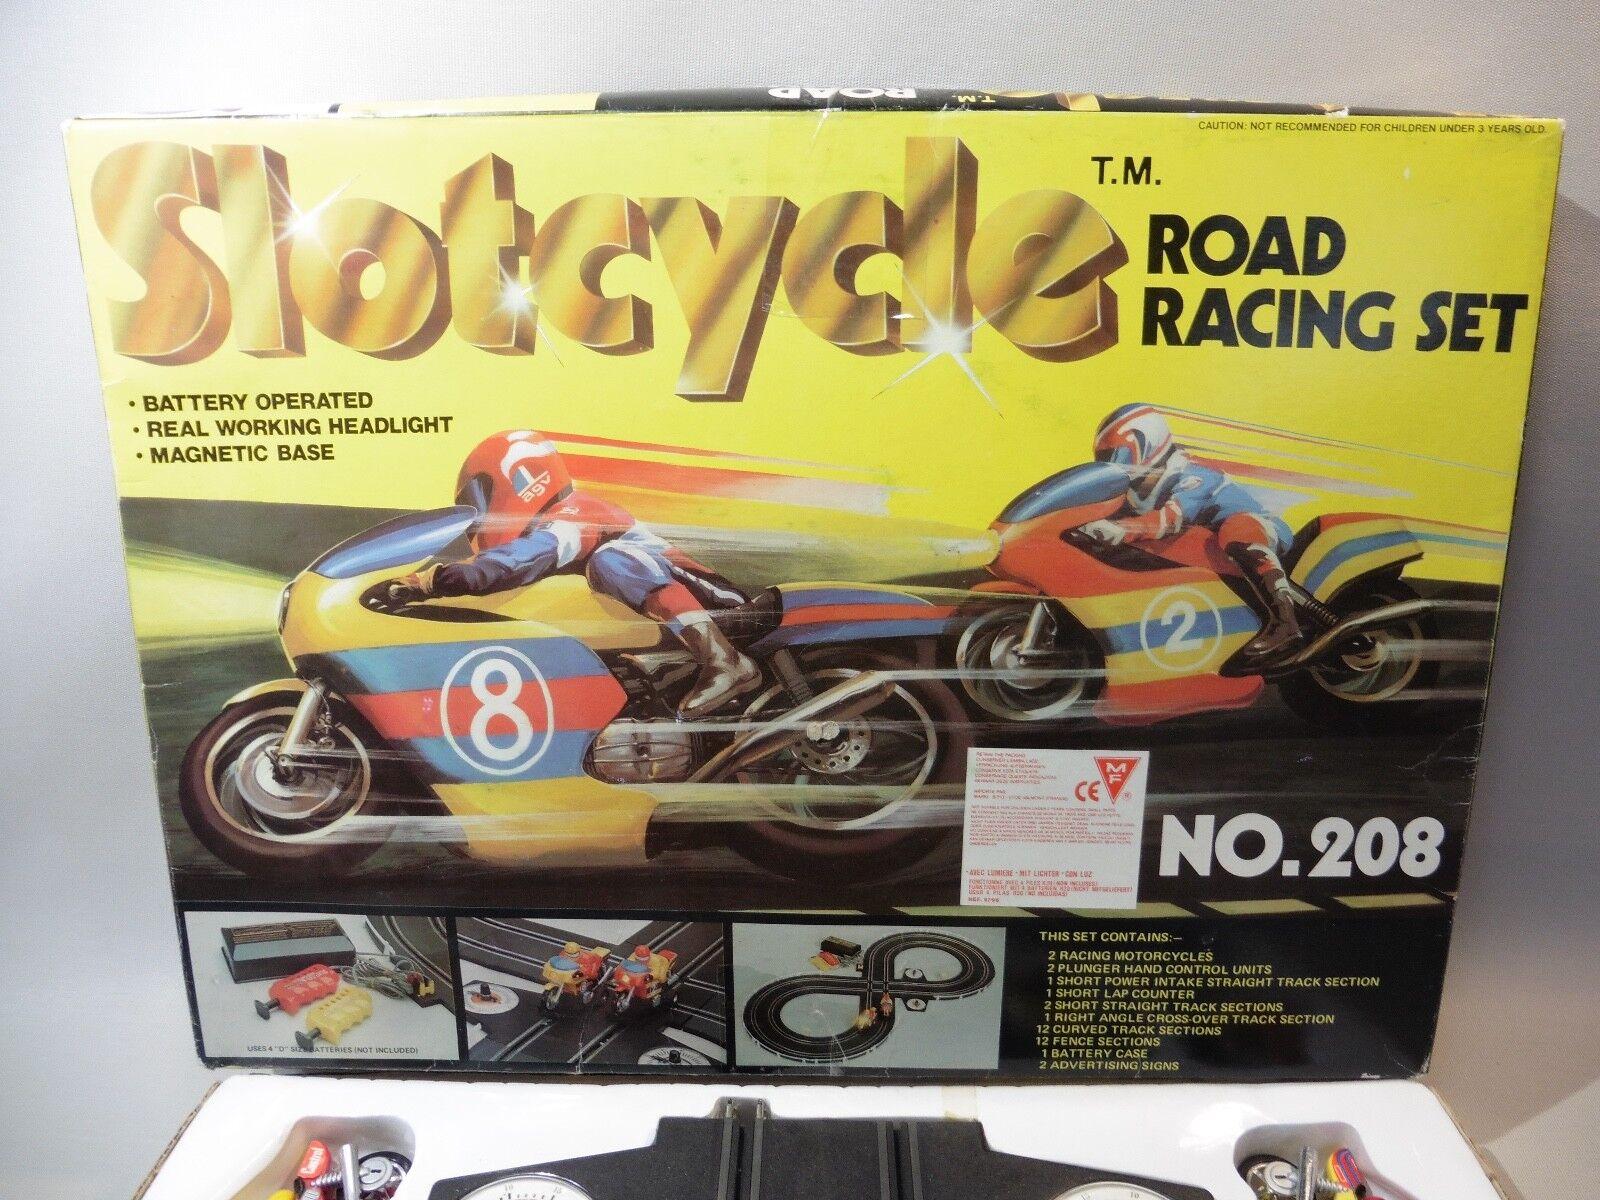 CIRCUIT MOTO SLOTCYCLE ROAD RACING RACING RACING SET NO.208  MADE IN HONG KONG SOLD IN L' 86367b